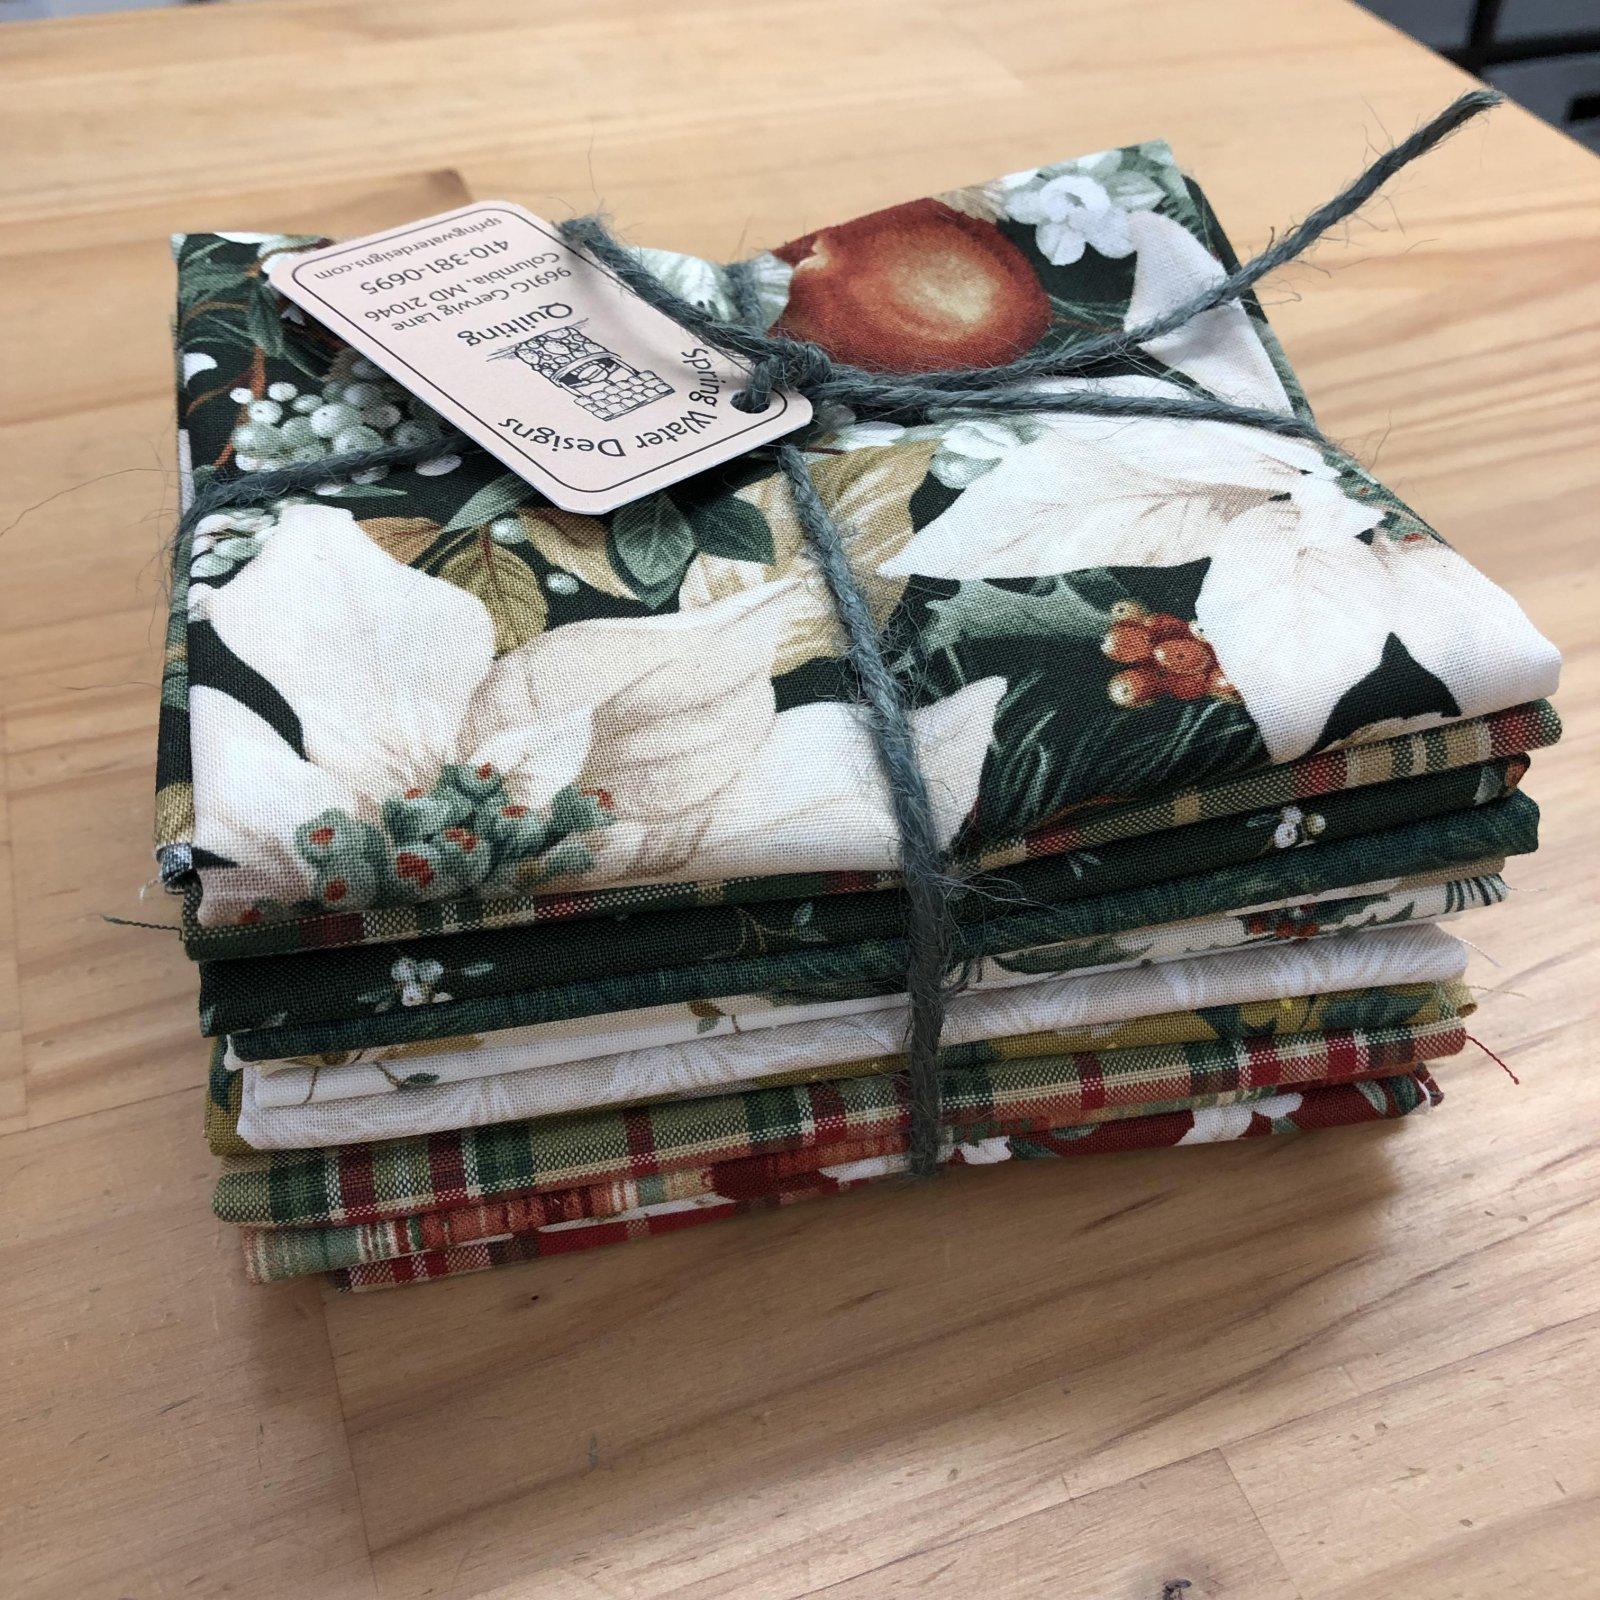 Winter Botanicals by Laura Berringer Fat Quarter Bundle - 13 Fats